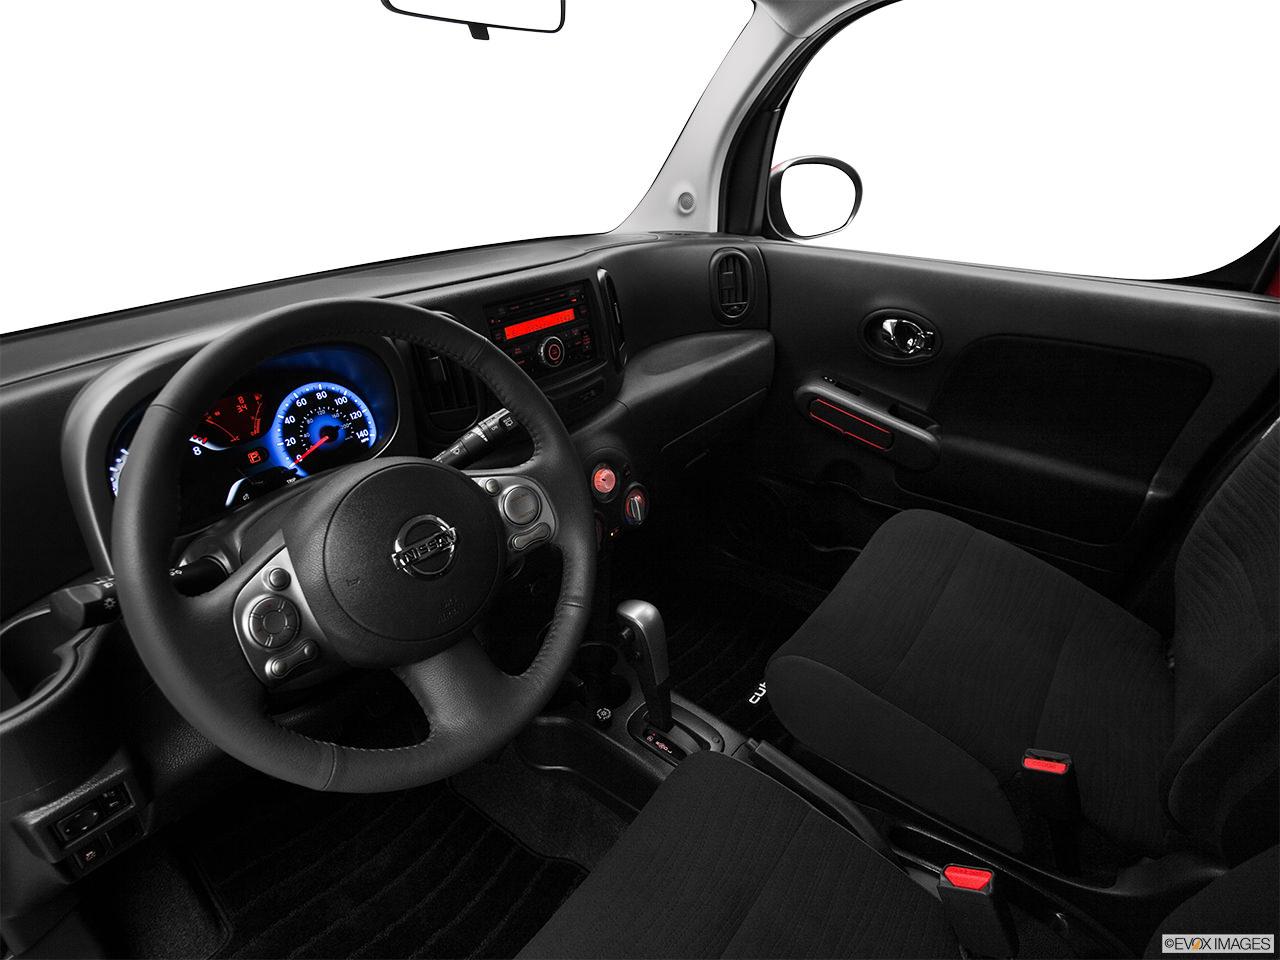 Nissan Cube 2012 Interior